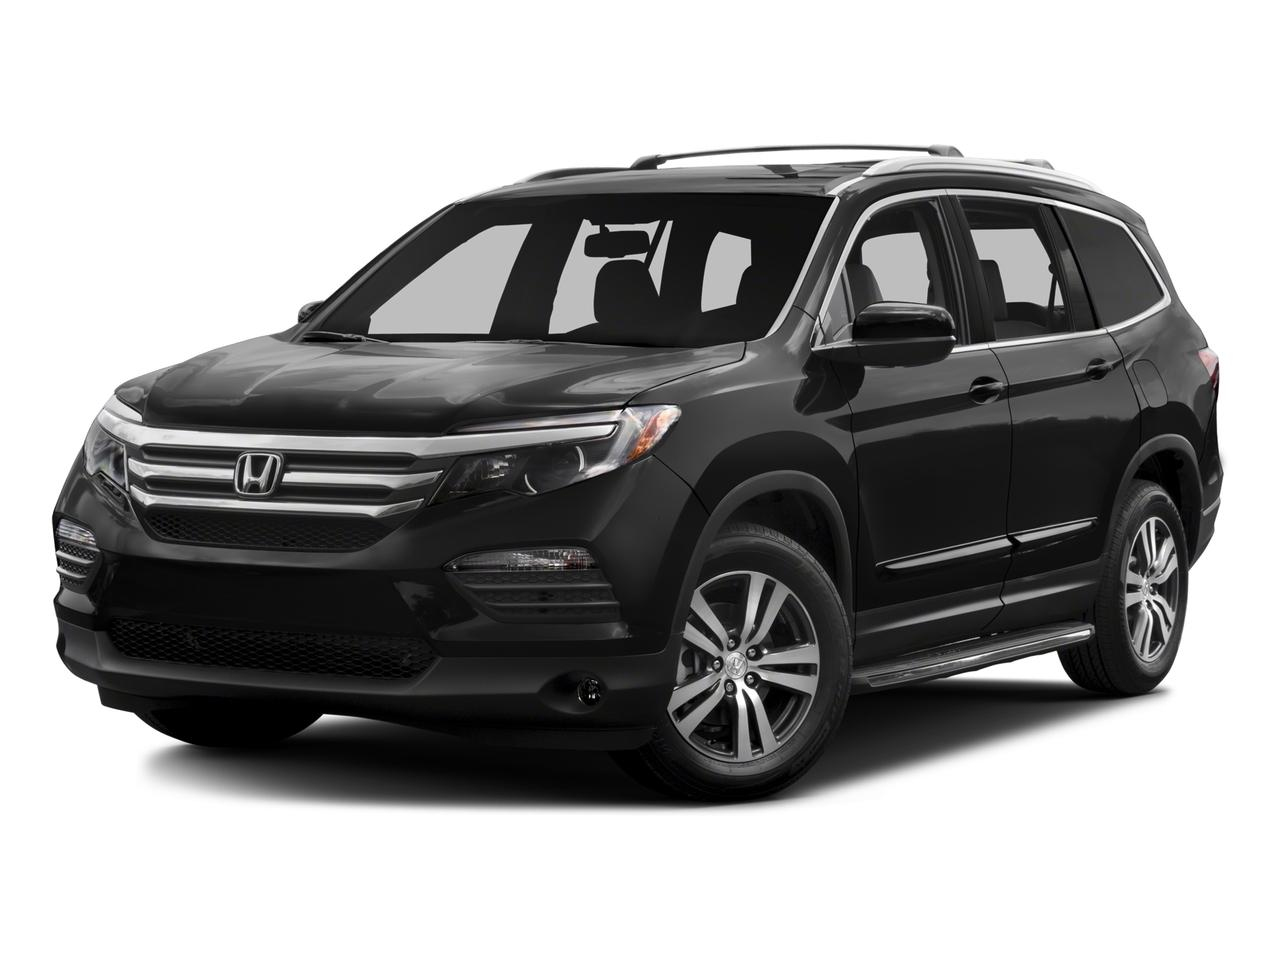 2016 Honda Pilot Vehicle Photo in Kingwood, TX 77339